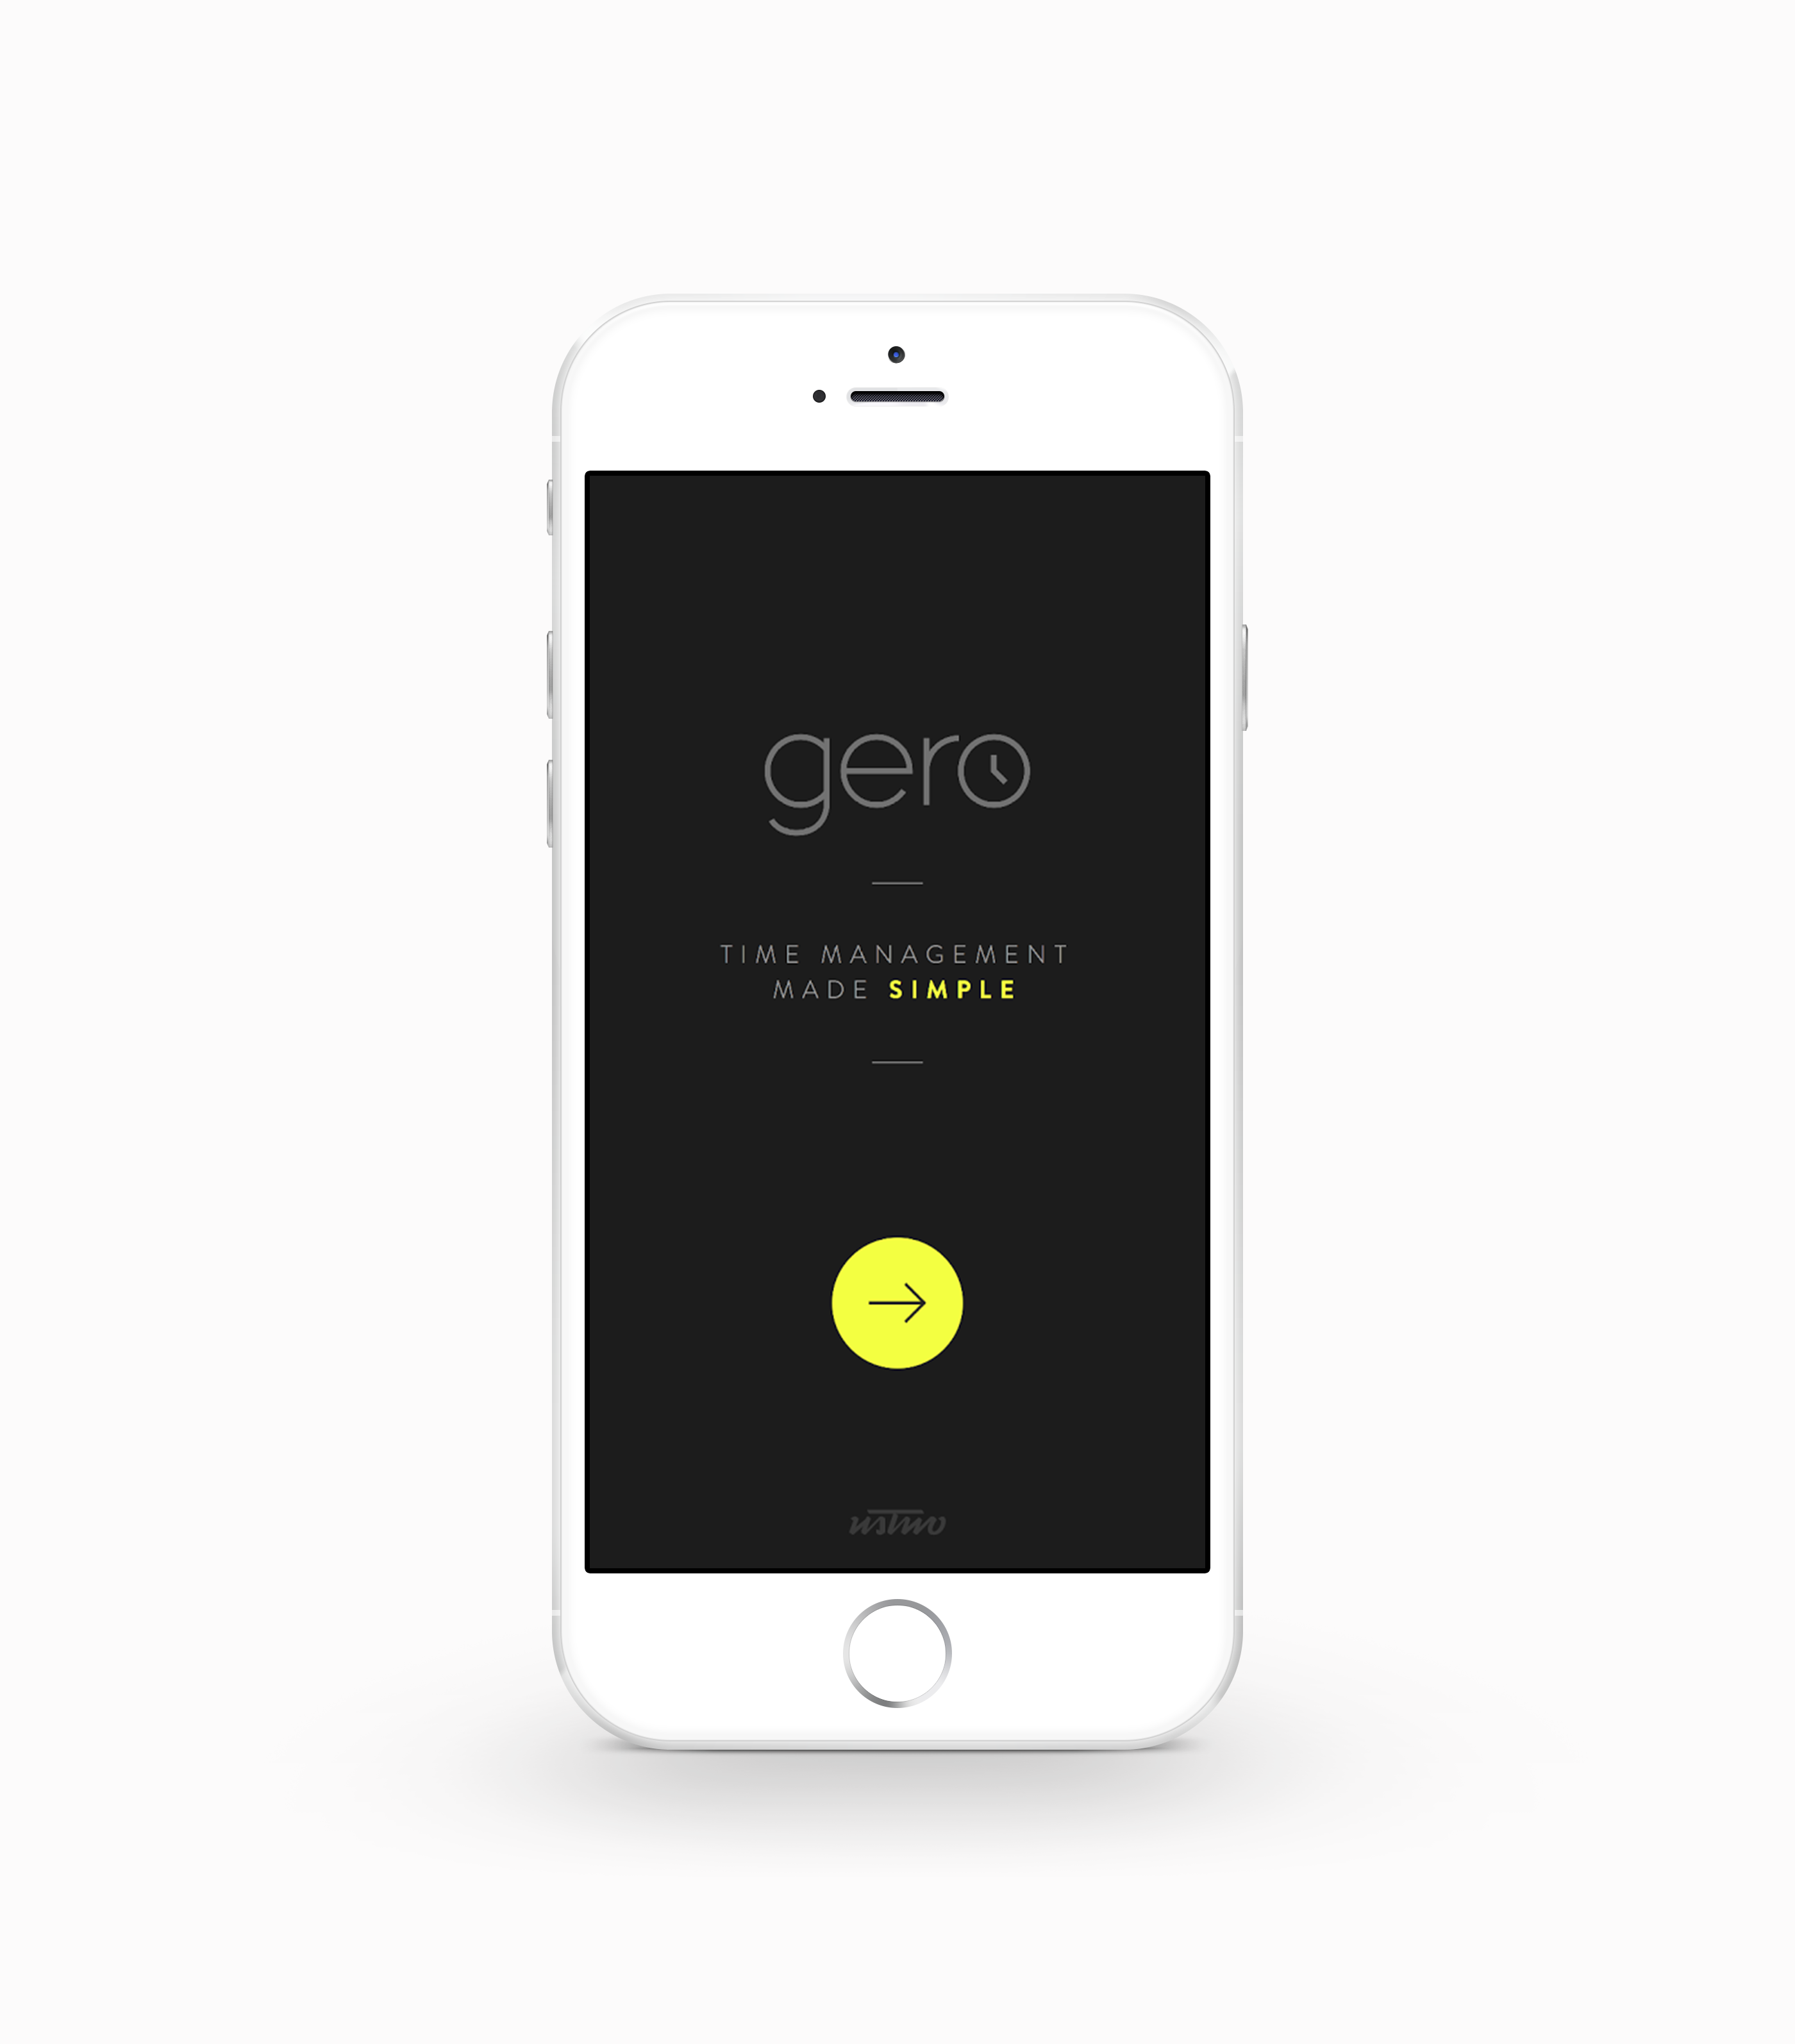 gero iphone 1